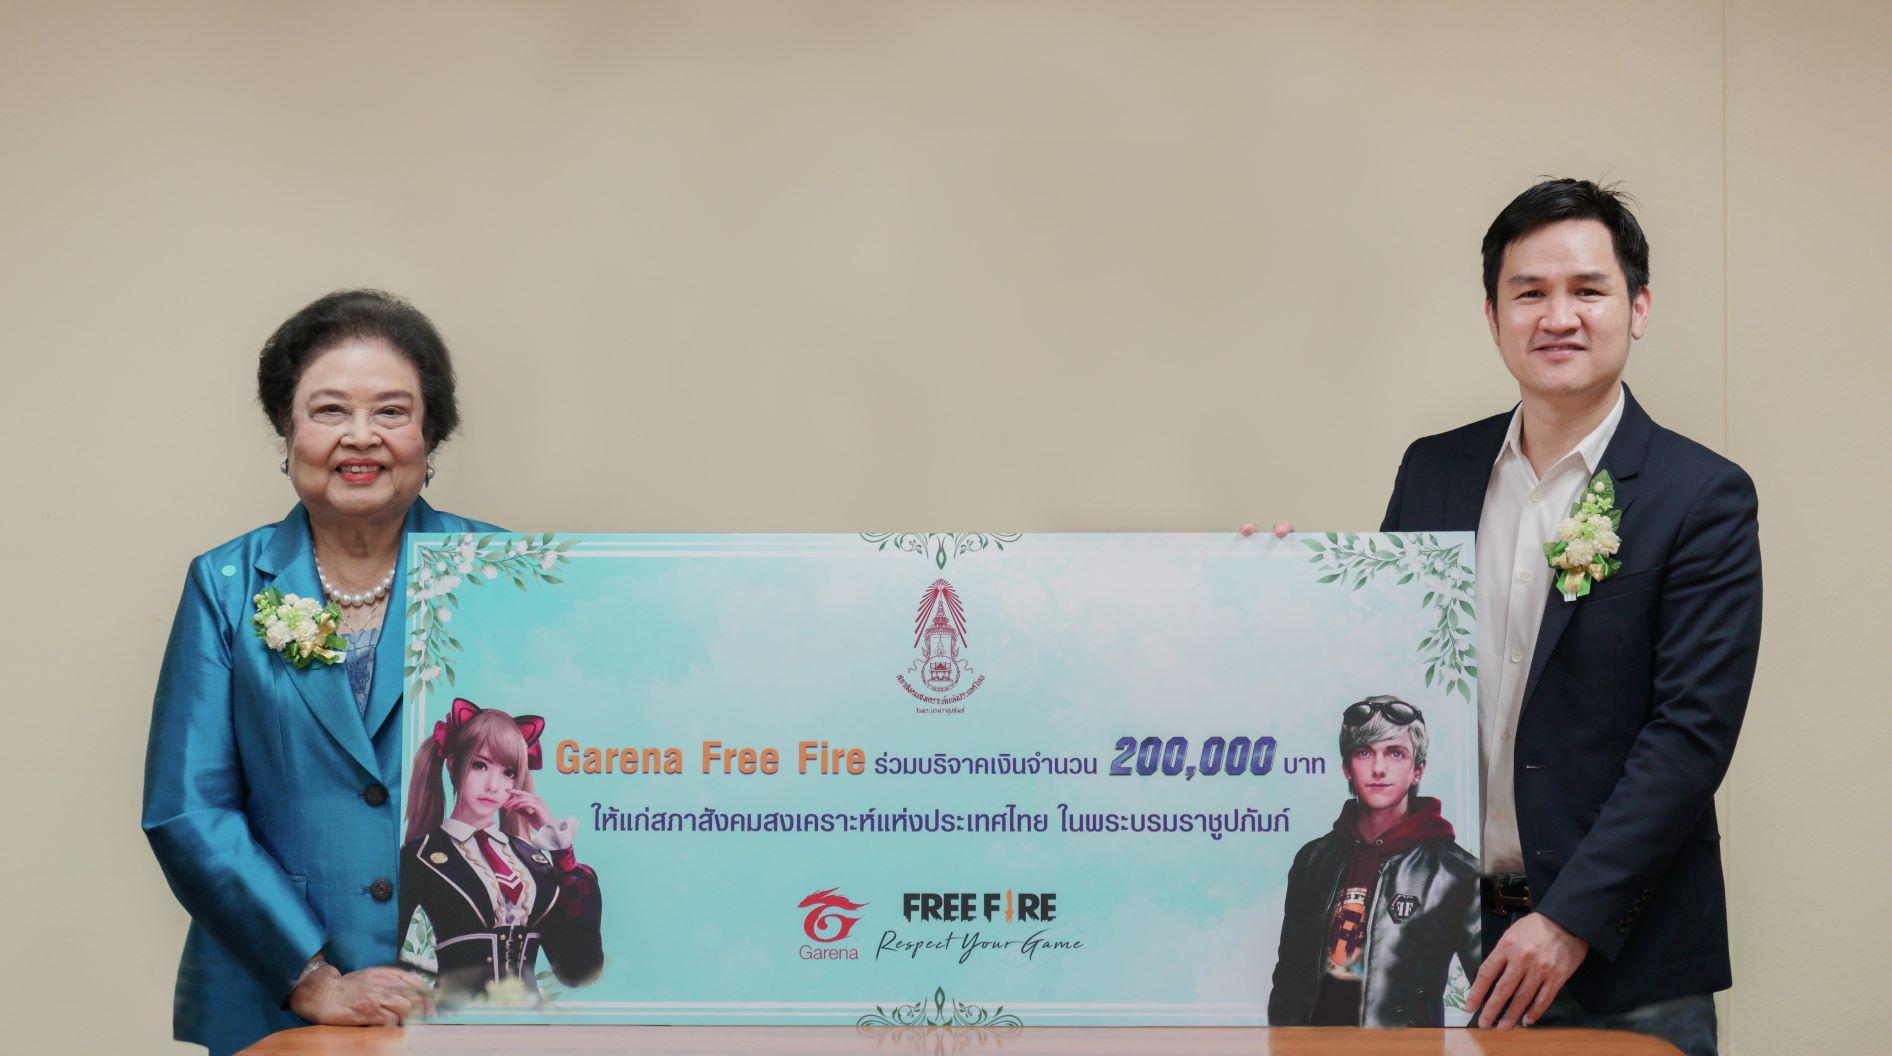 Free Fire 2182020